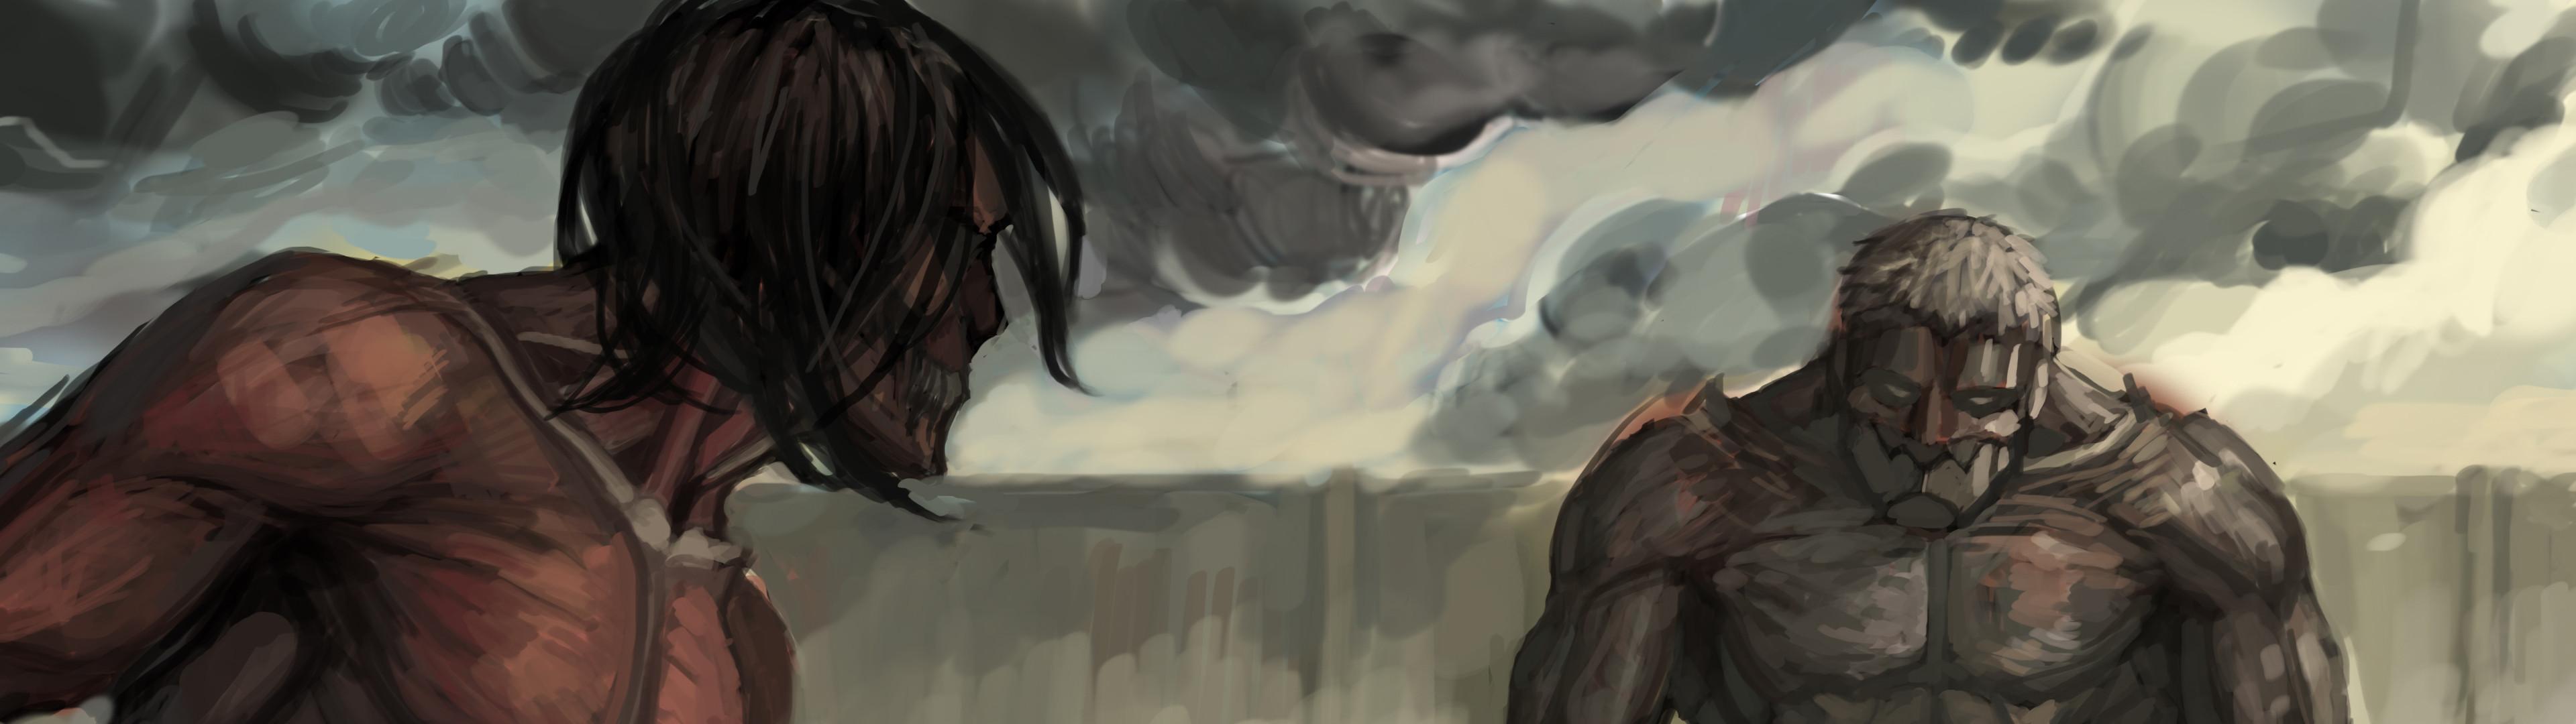 Anime Attack On Titan Wallpaper Resolution 3840x1080 Id 1041371 Wallha Com